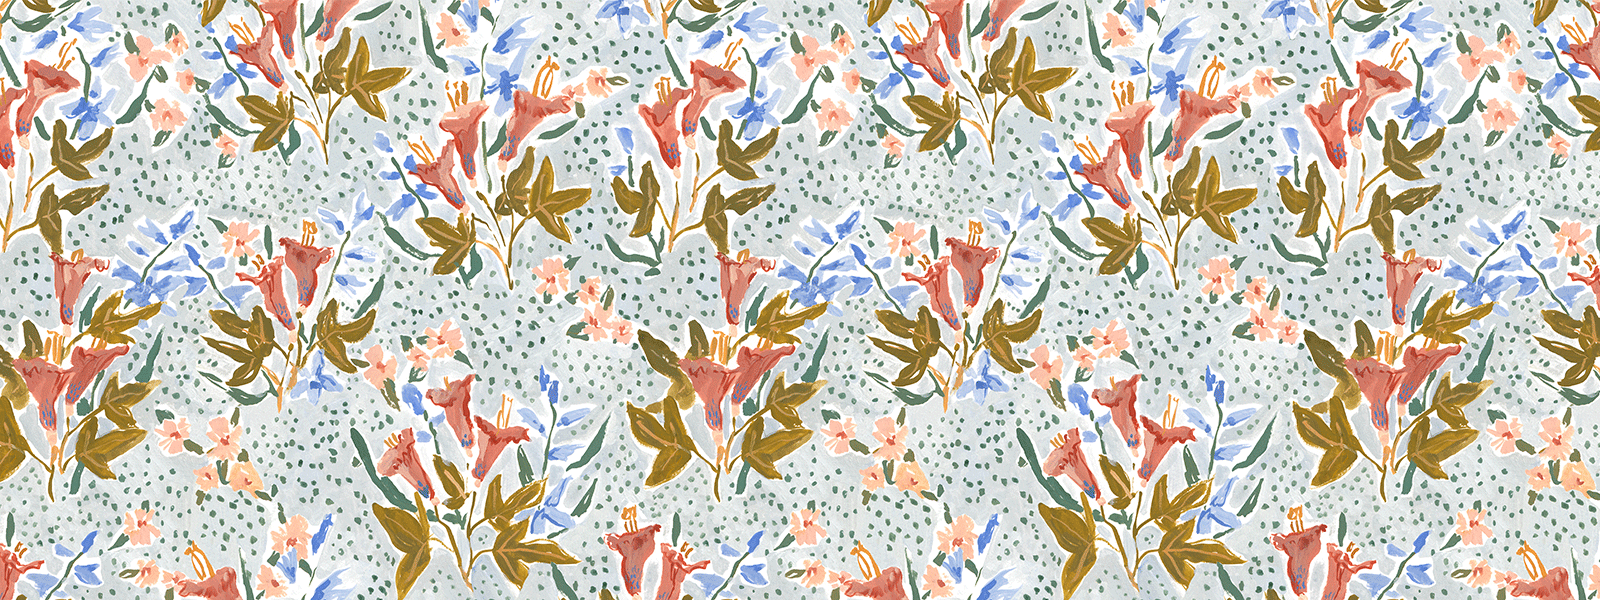 Pattern_10_Margaret-Jeane.png